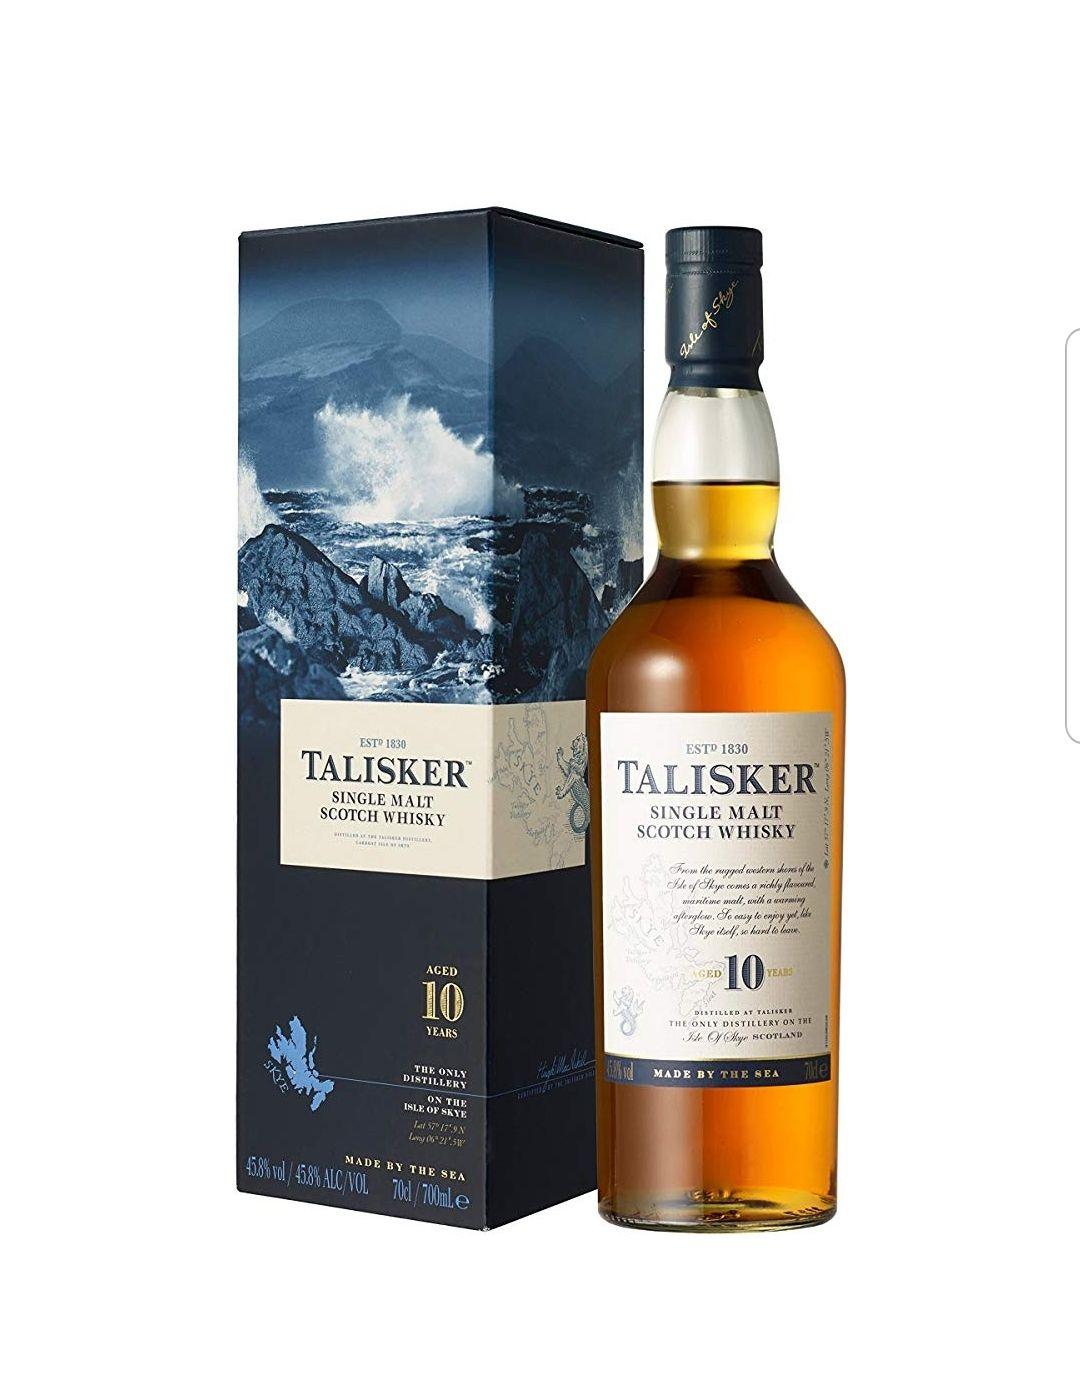 Talisker 10 Years Old Single Malt Scotch Whisky, 70cl £28 Amazon